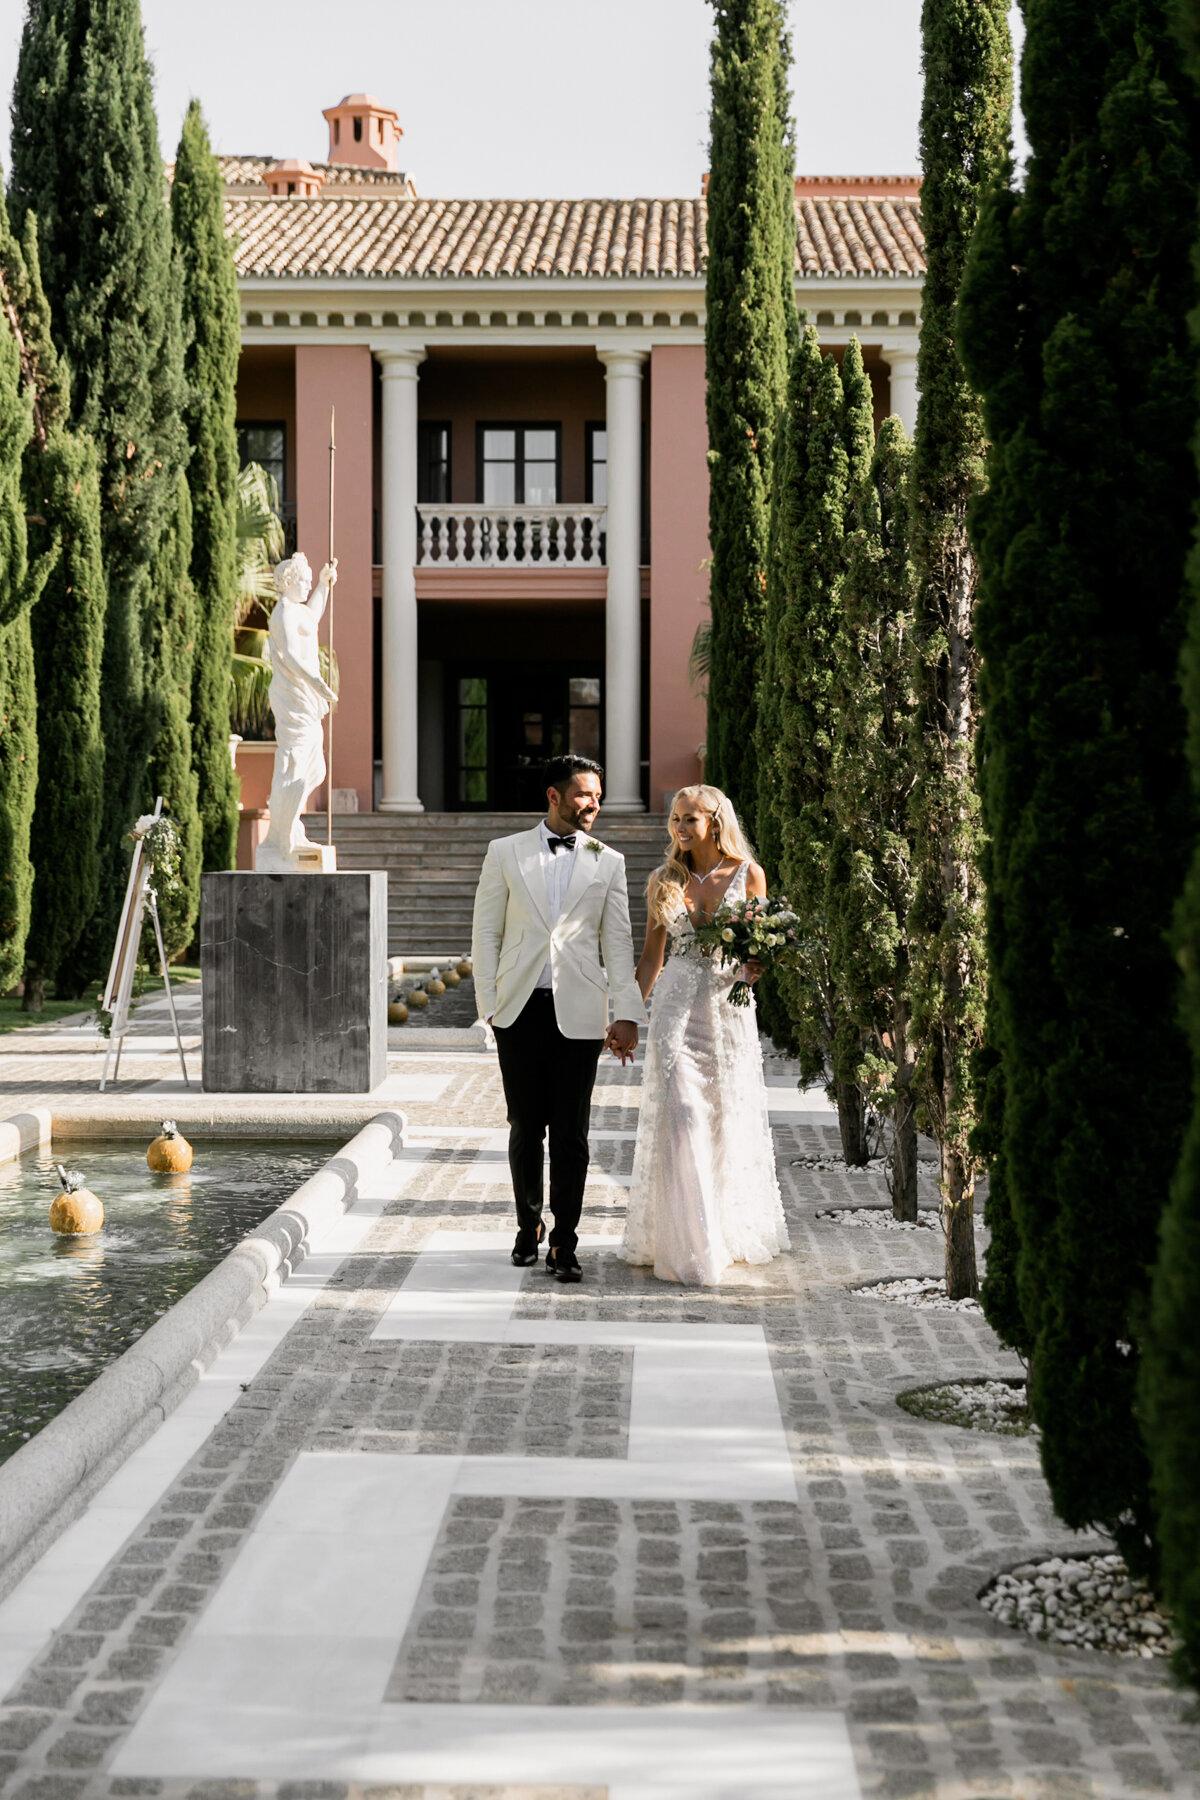 Anantara Marbella luxury palace